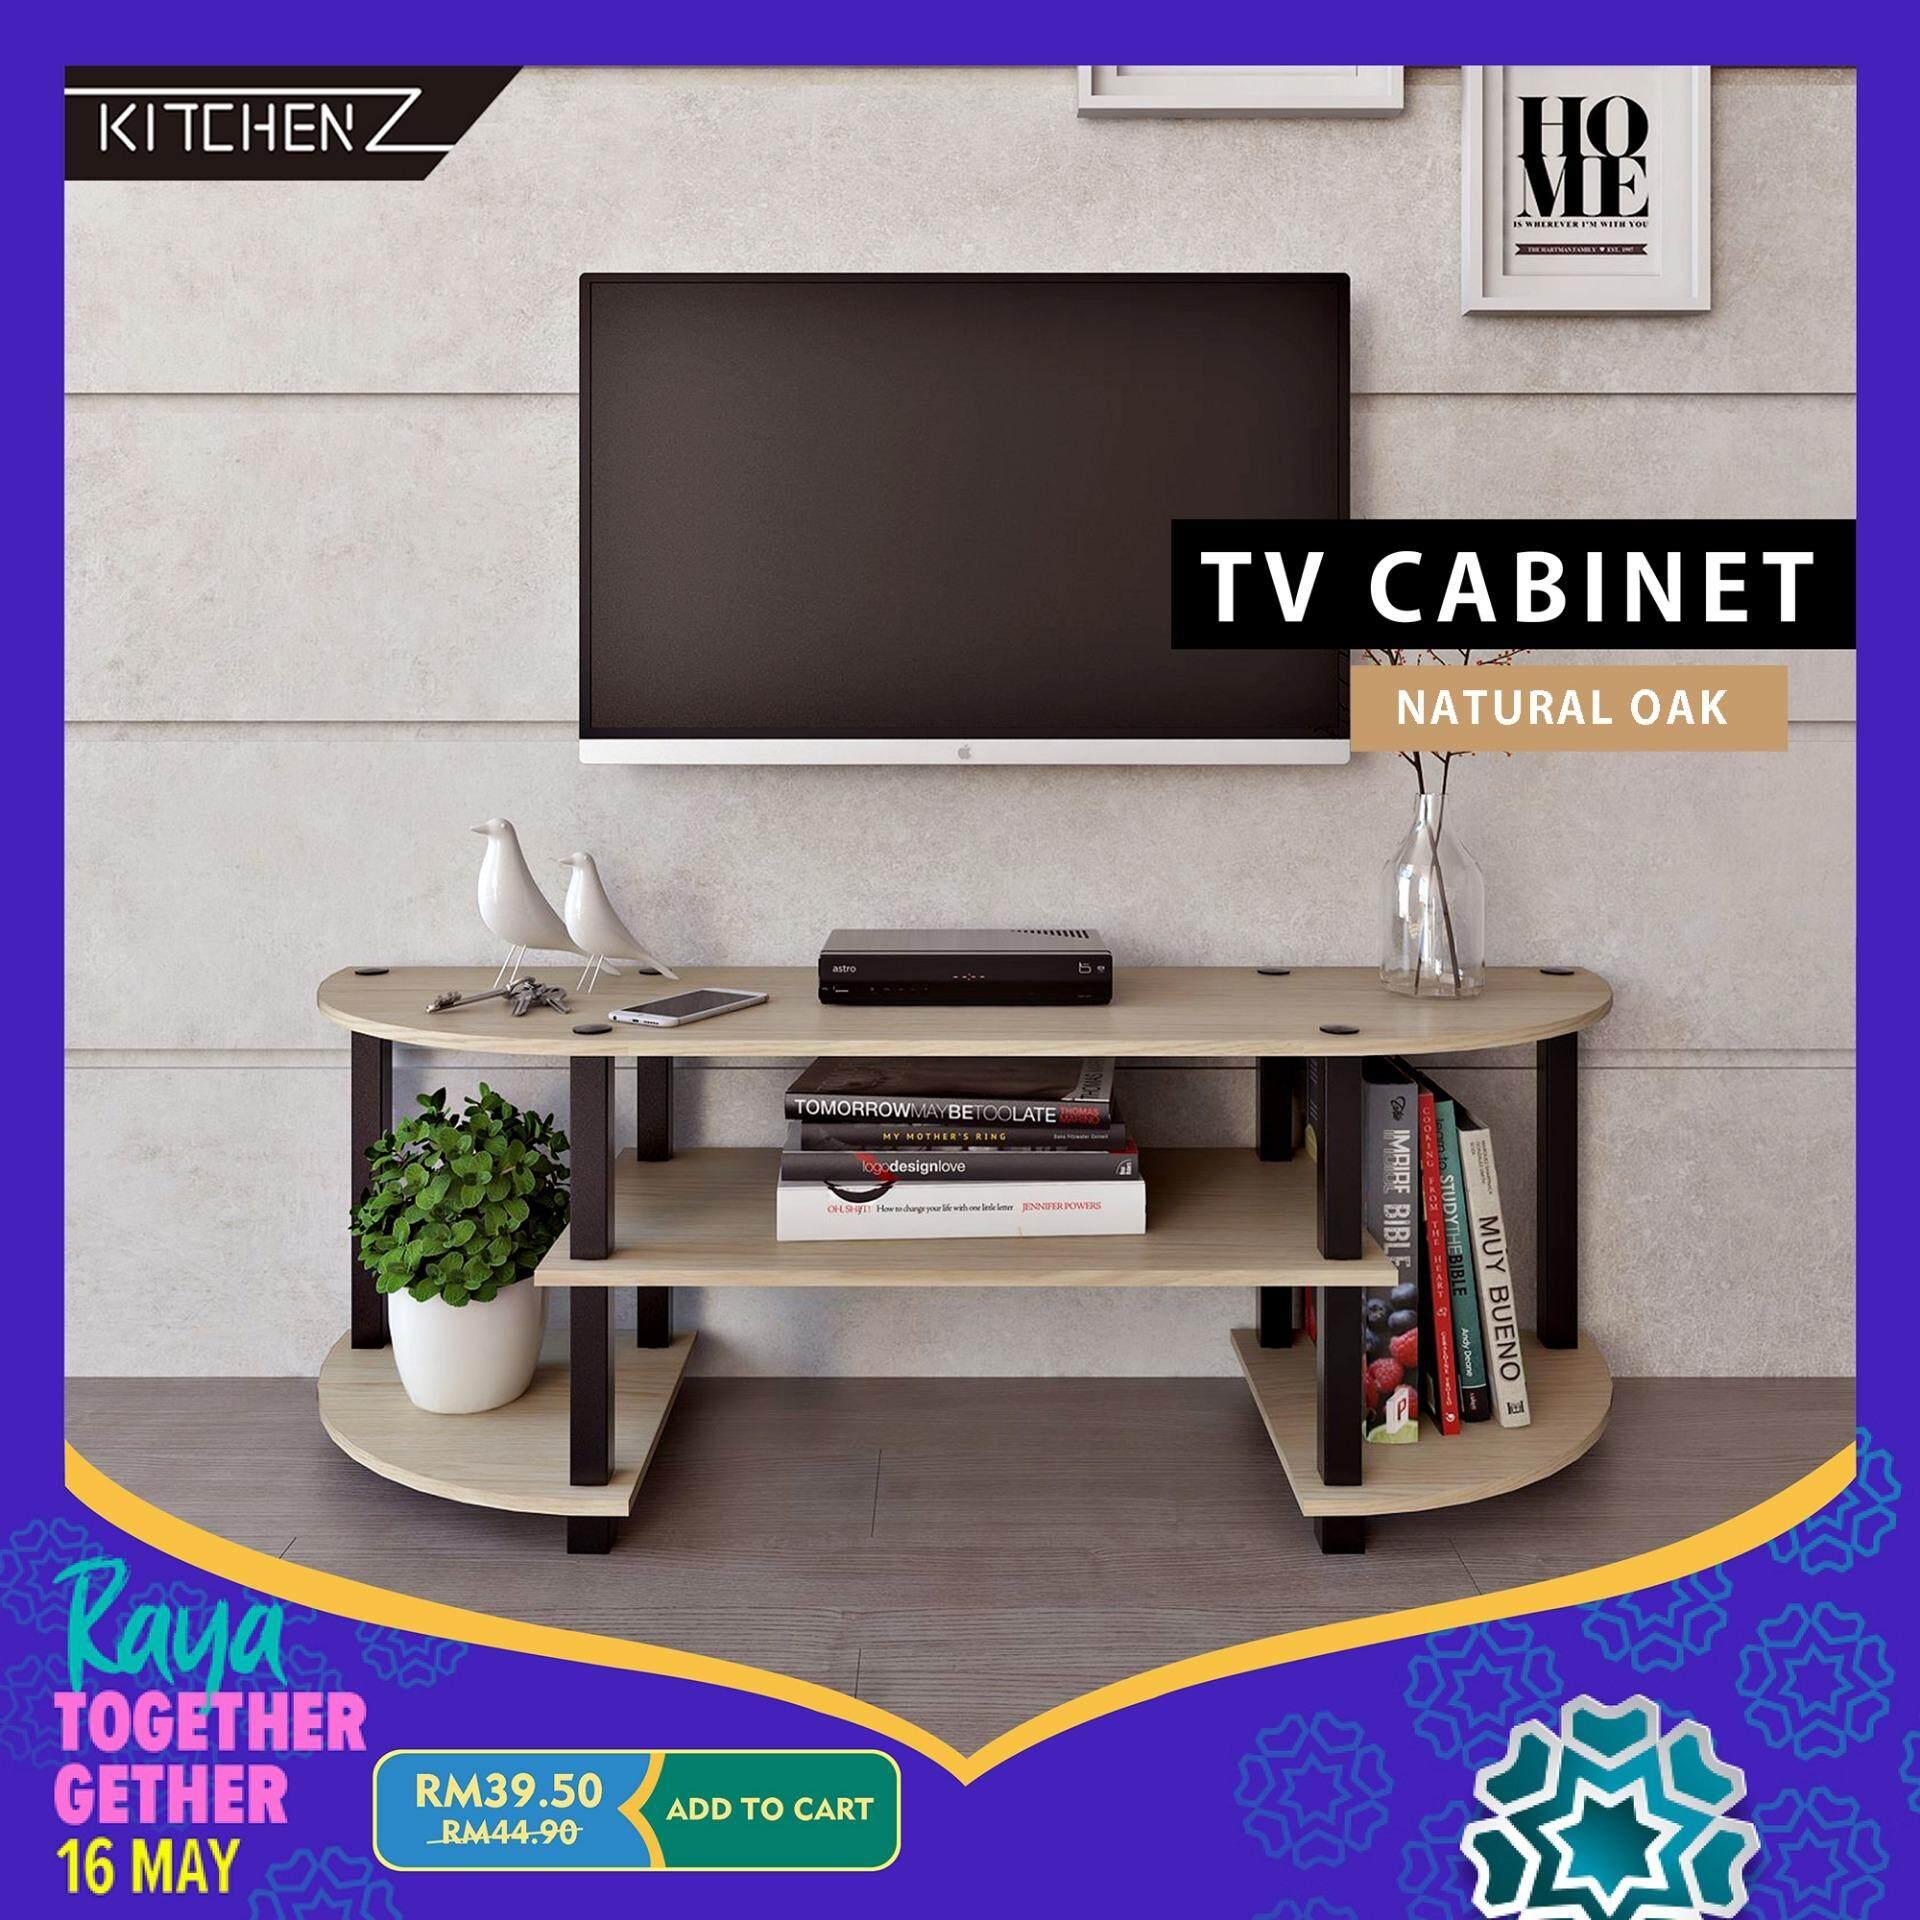 Homez Tv Cabinet Hmz-Tv-Dt-5000 Modernist Design Solid Board Tv Rack / Console / Rak - 4 Ft By Kitchen Z.